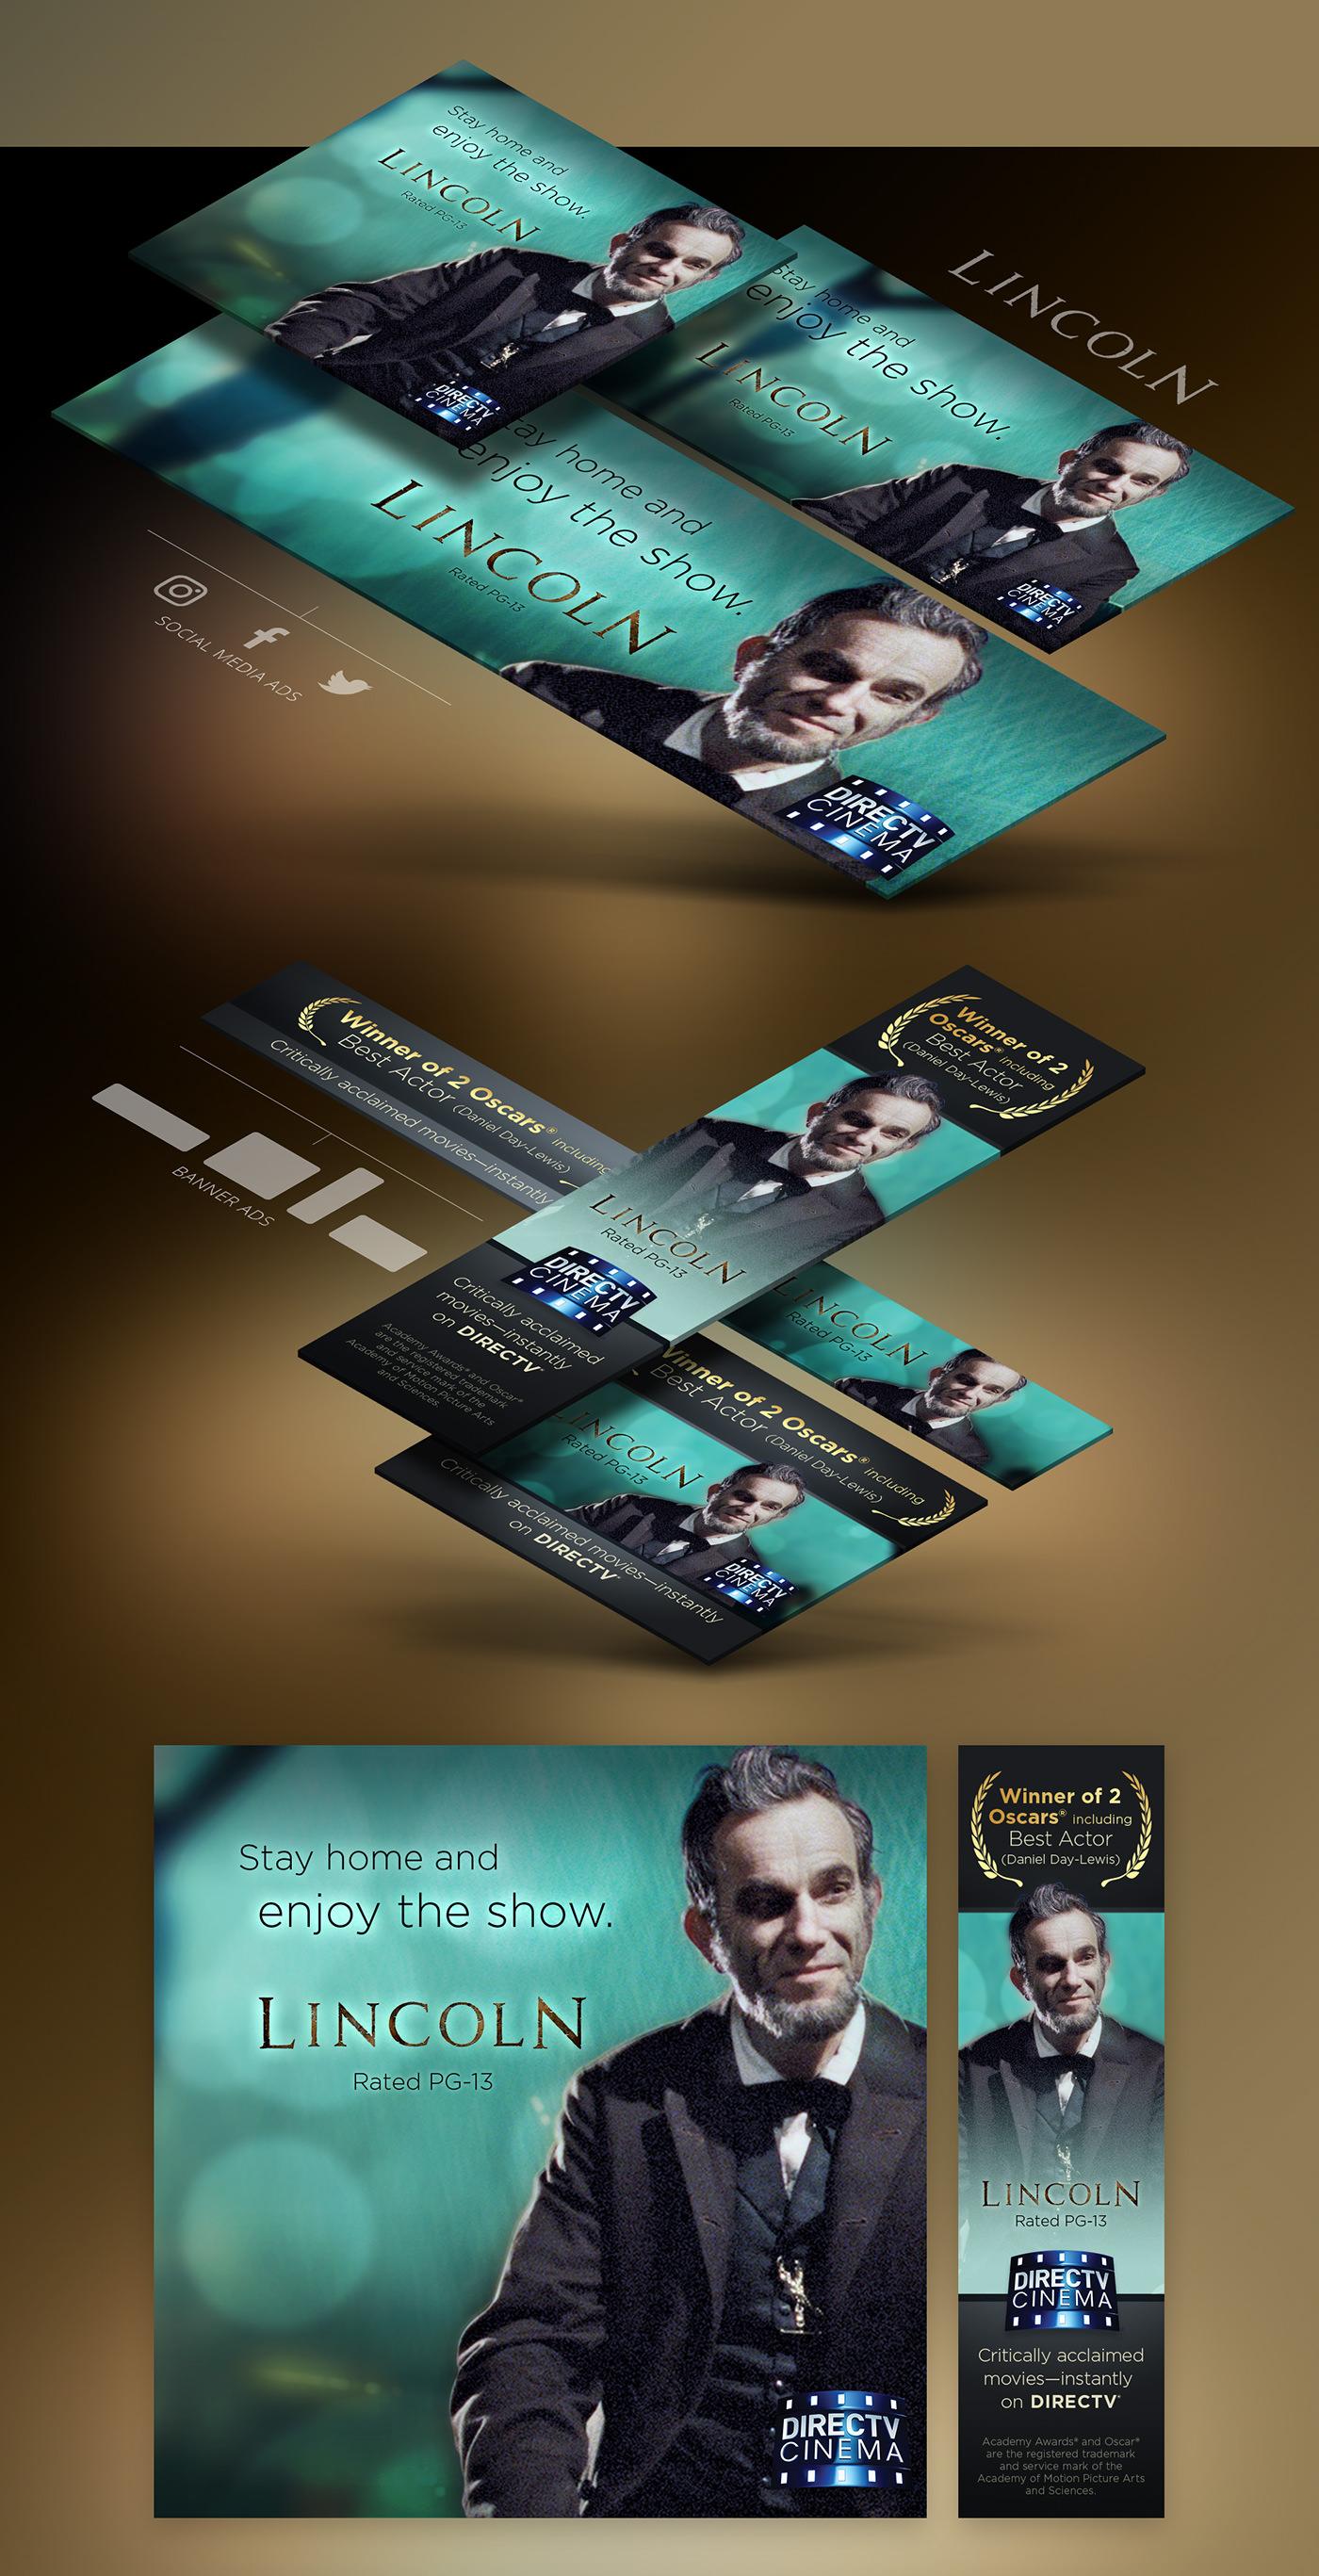 DirecTV Cinema social media banner ads Academy Awards instagram facebook twitter campaign